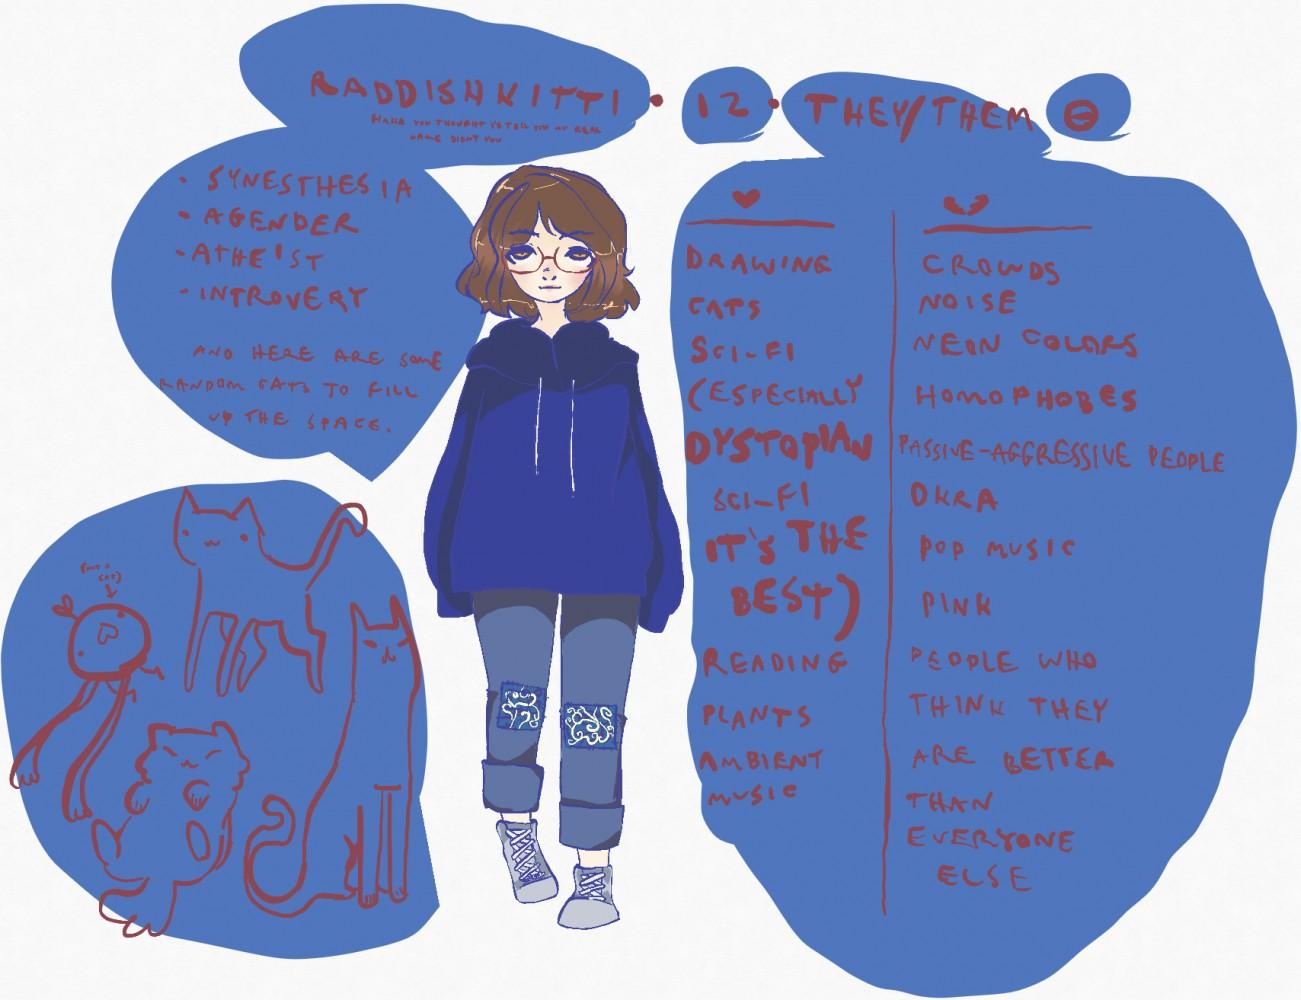 main-image-Meet the artist uploaded by Kittypoplar